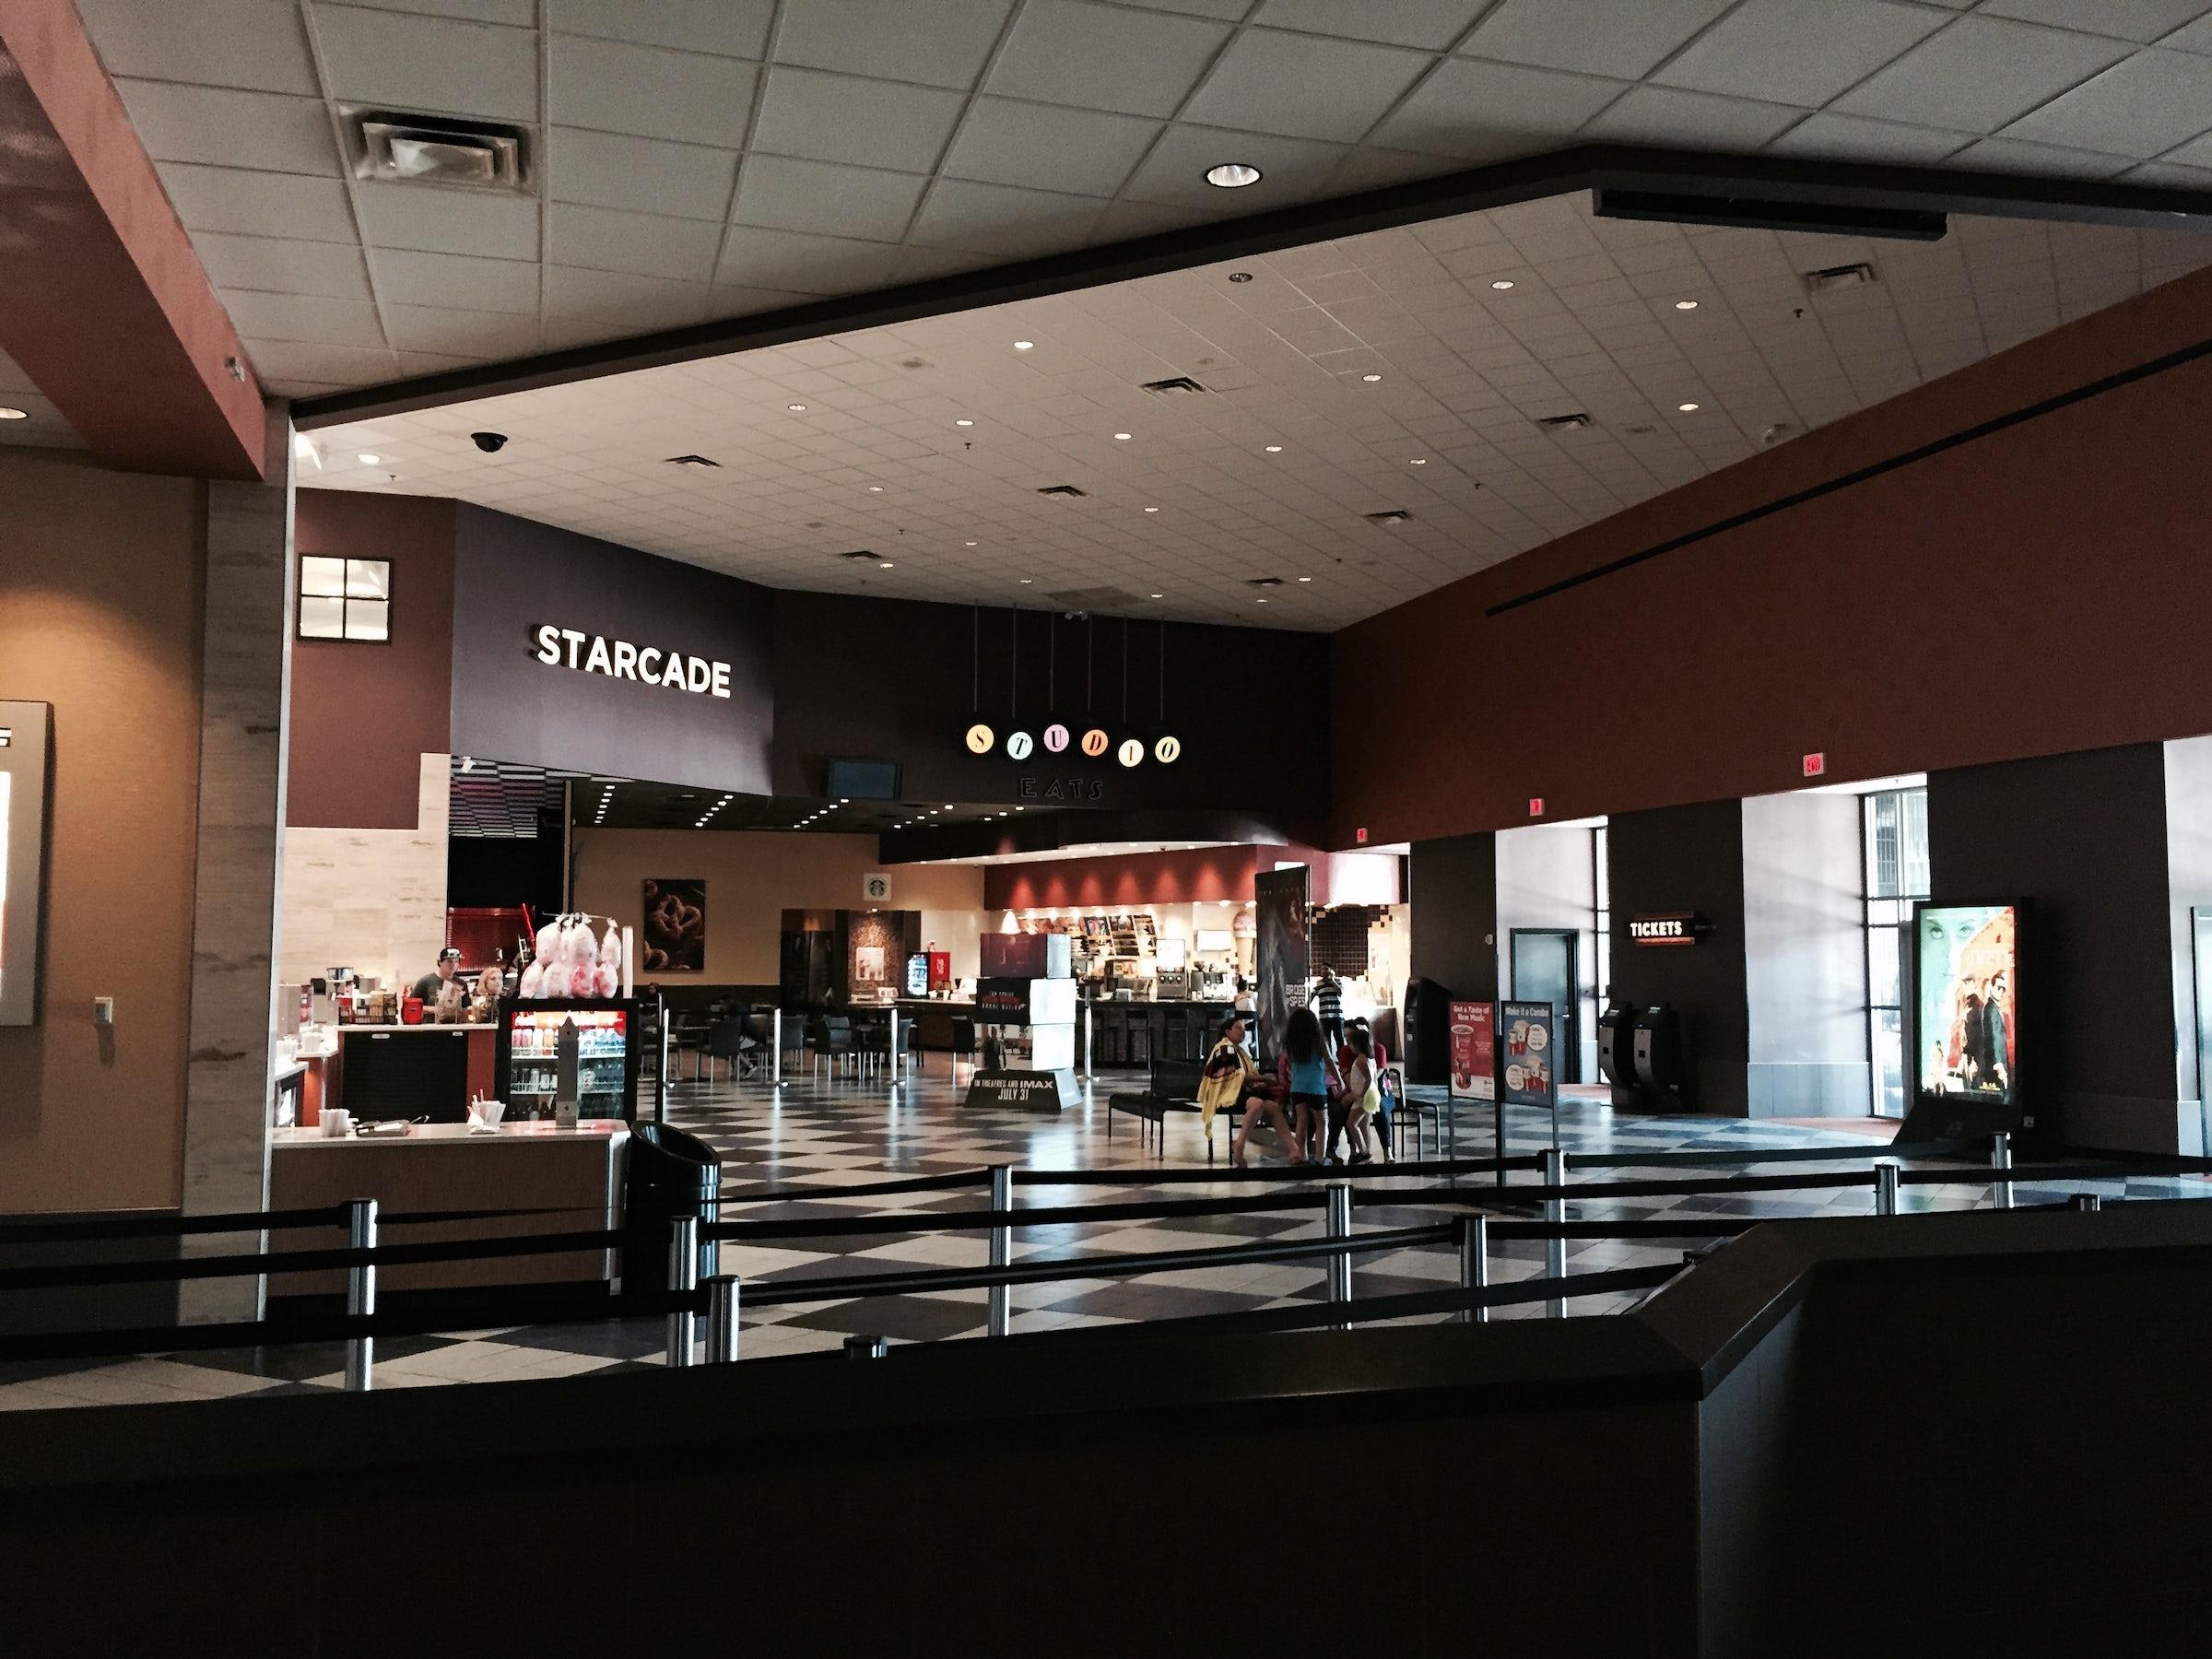 Cinemark 17 & IMAX in Beyond Dallas